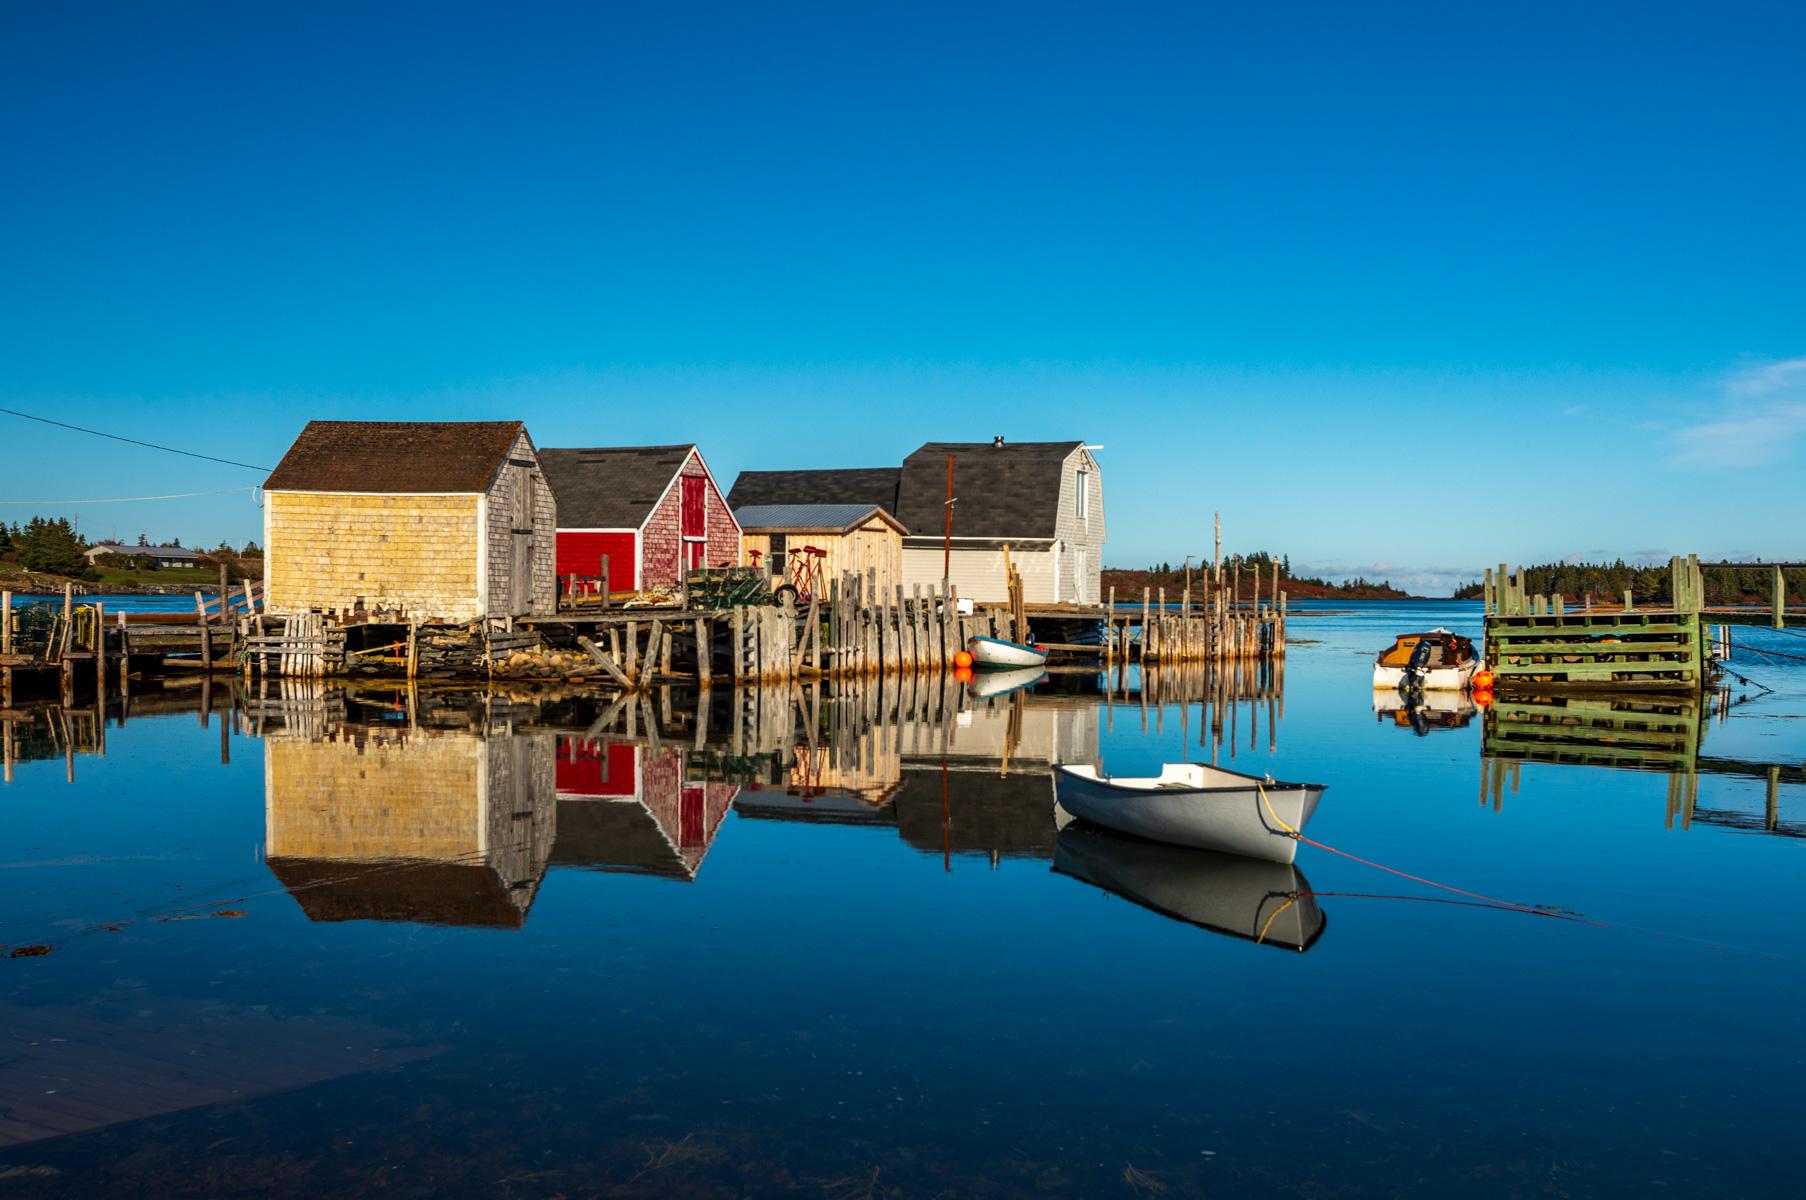 Fishing Village reflections, Blue Rocks, Nova Scotia, Canada